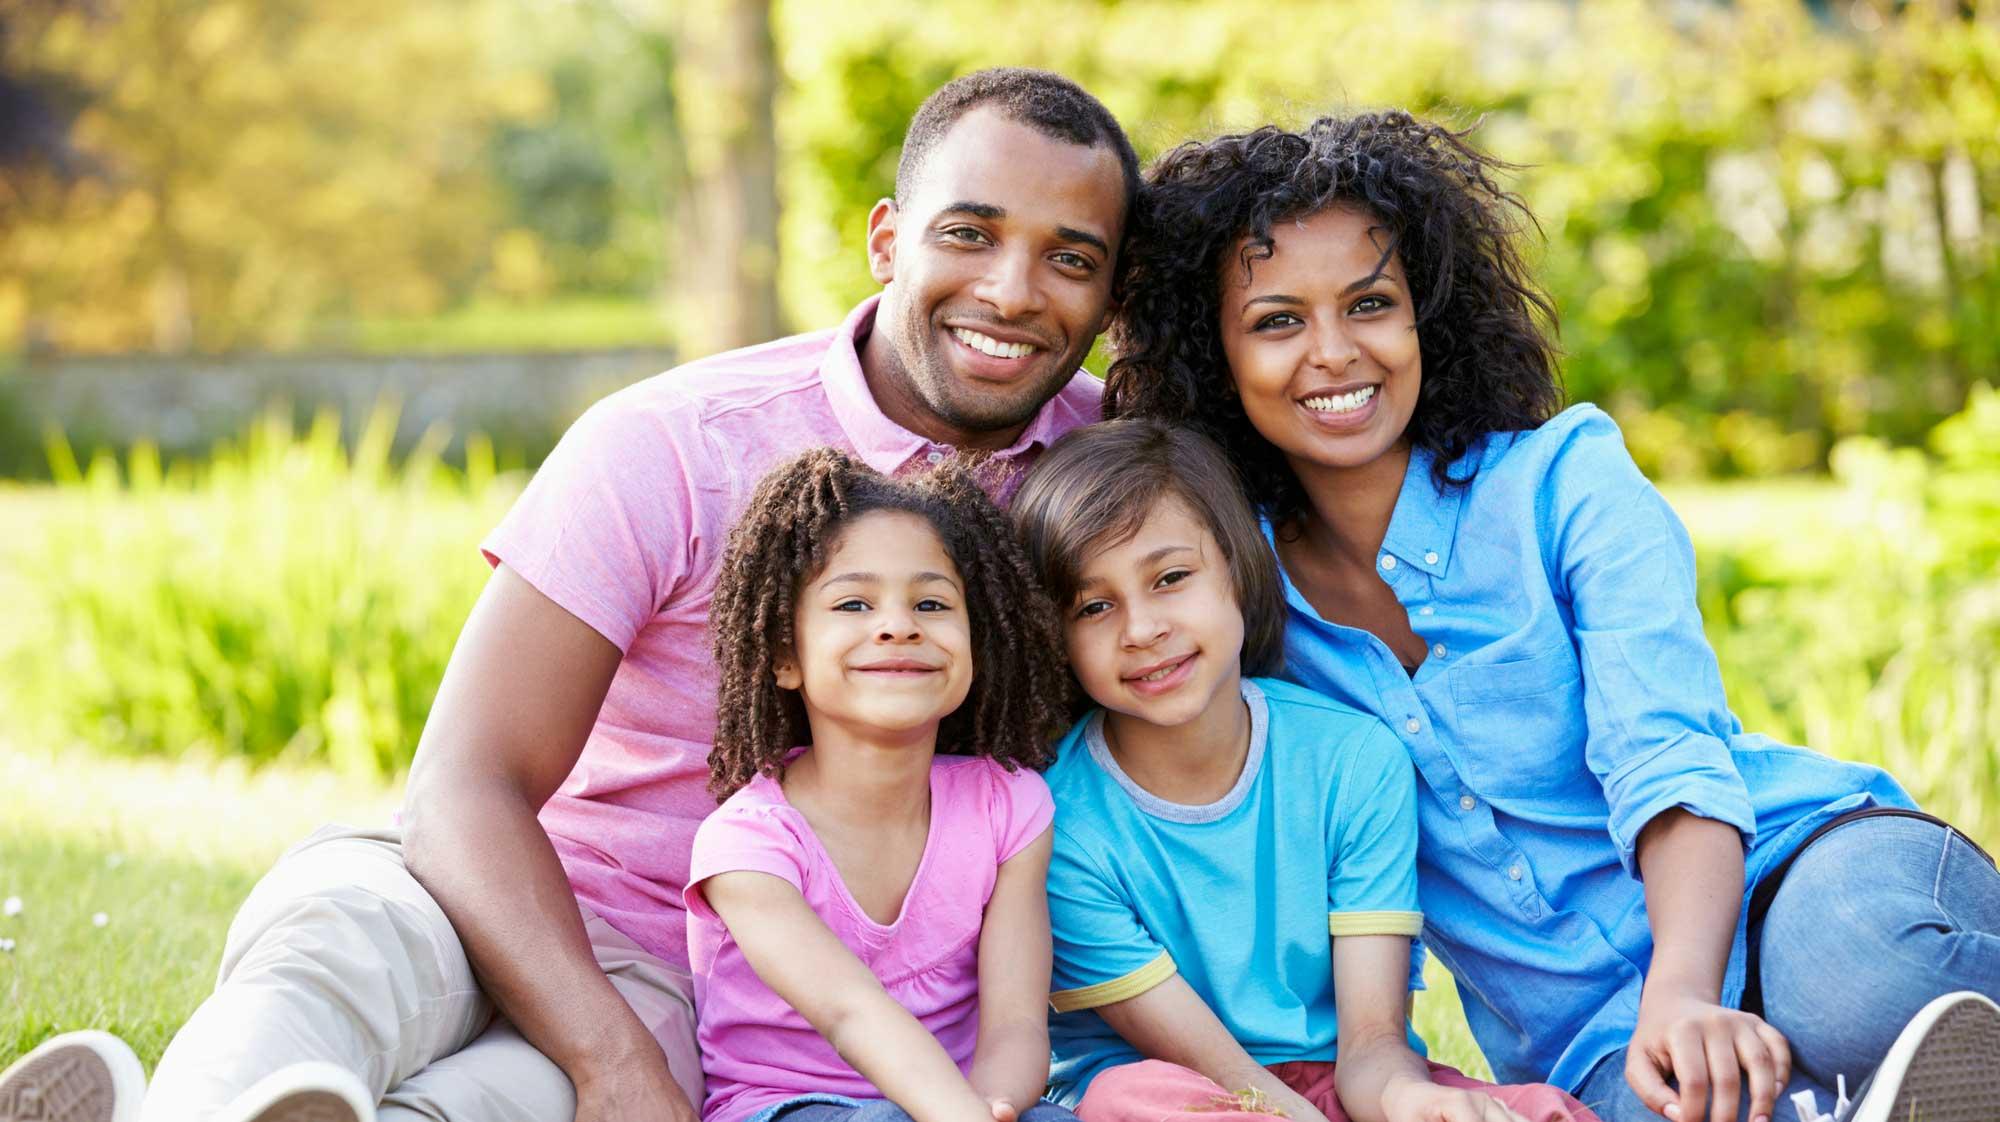 family dentist in henderson, nc - Roberson Family Dentistry